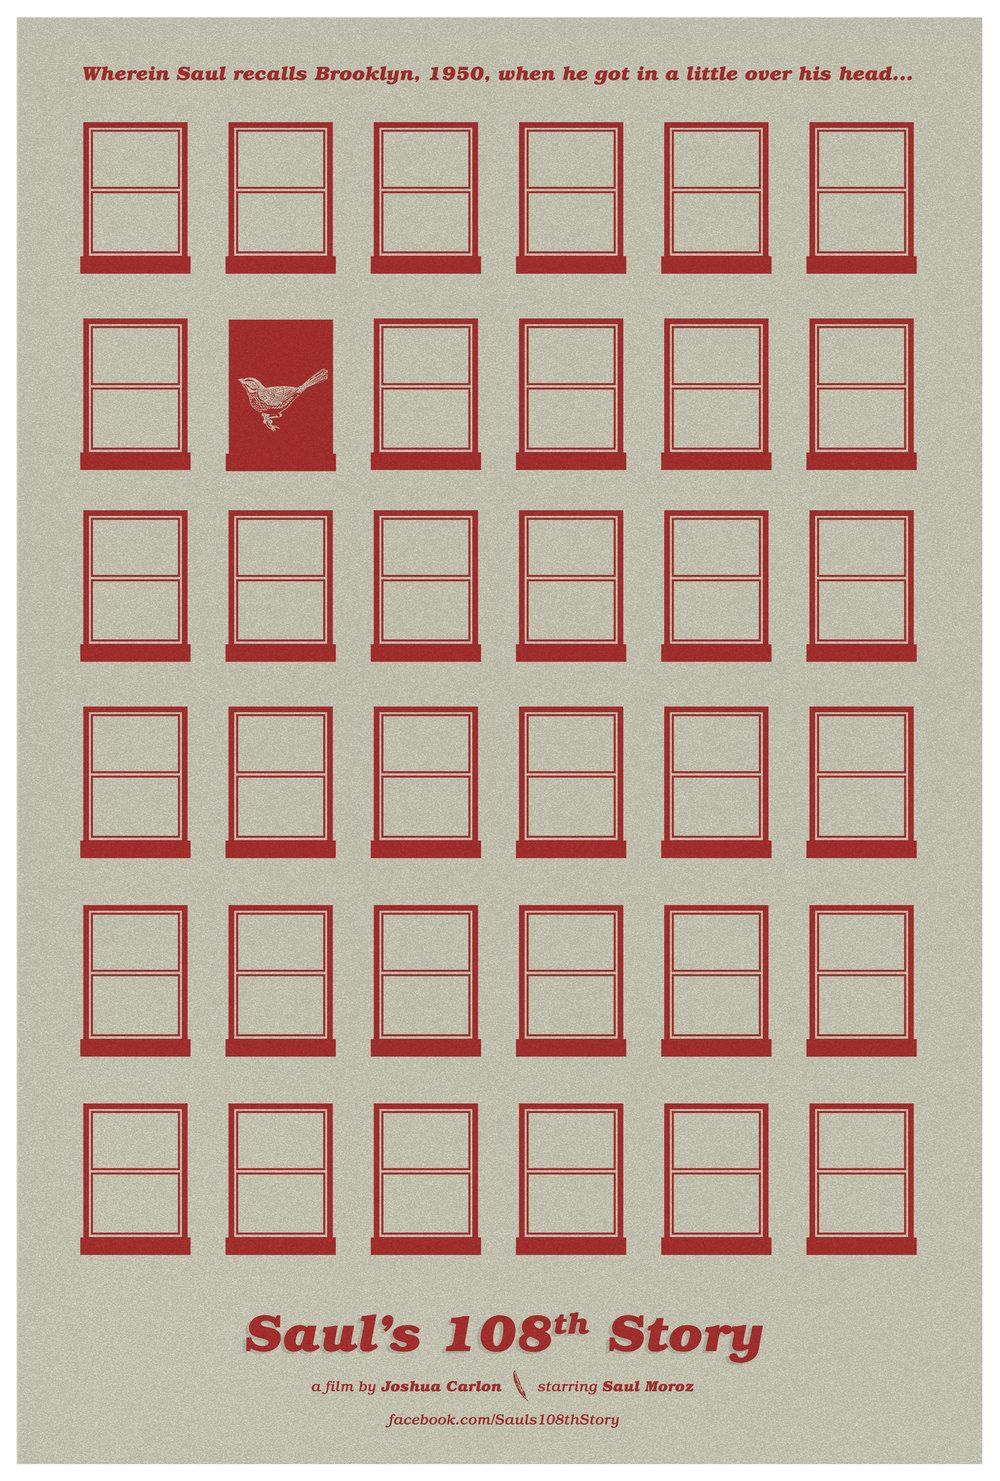 Sauls_108th_Story_Poster_Web.jpg